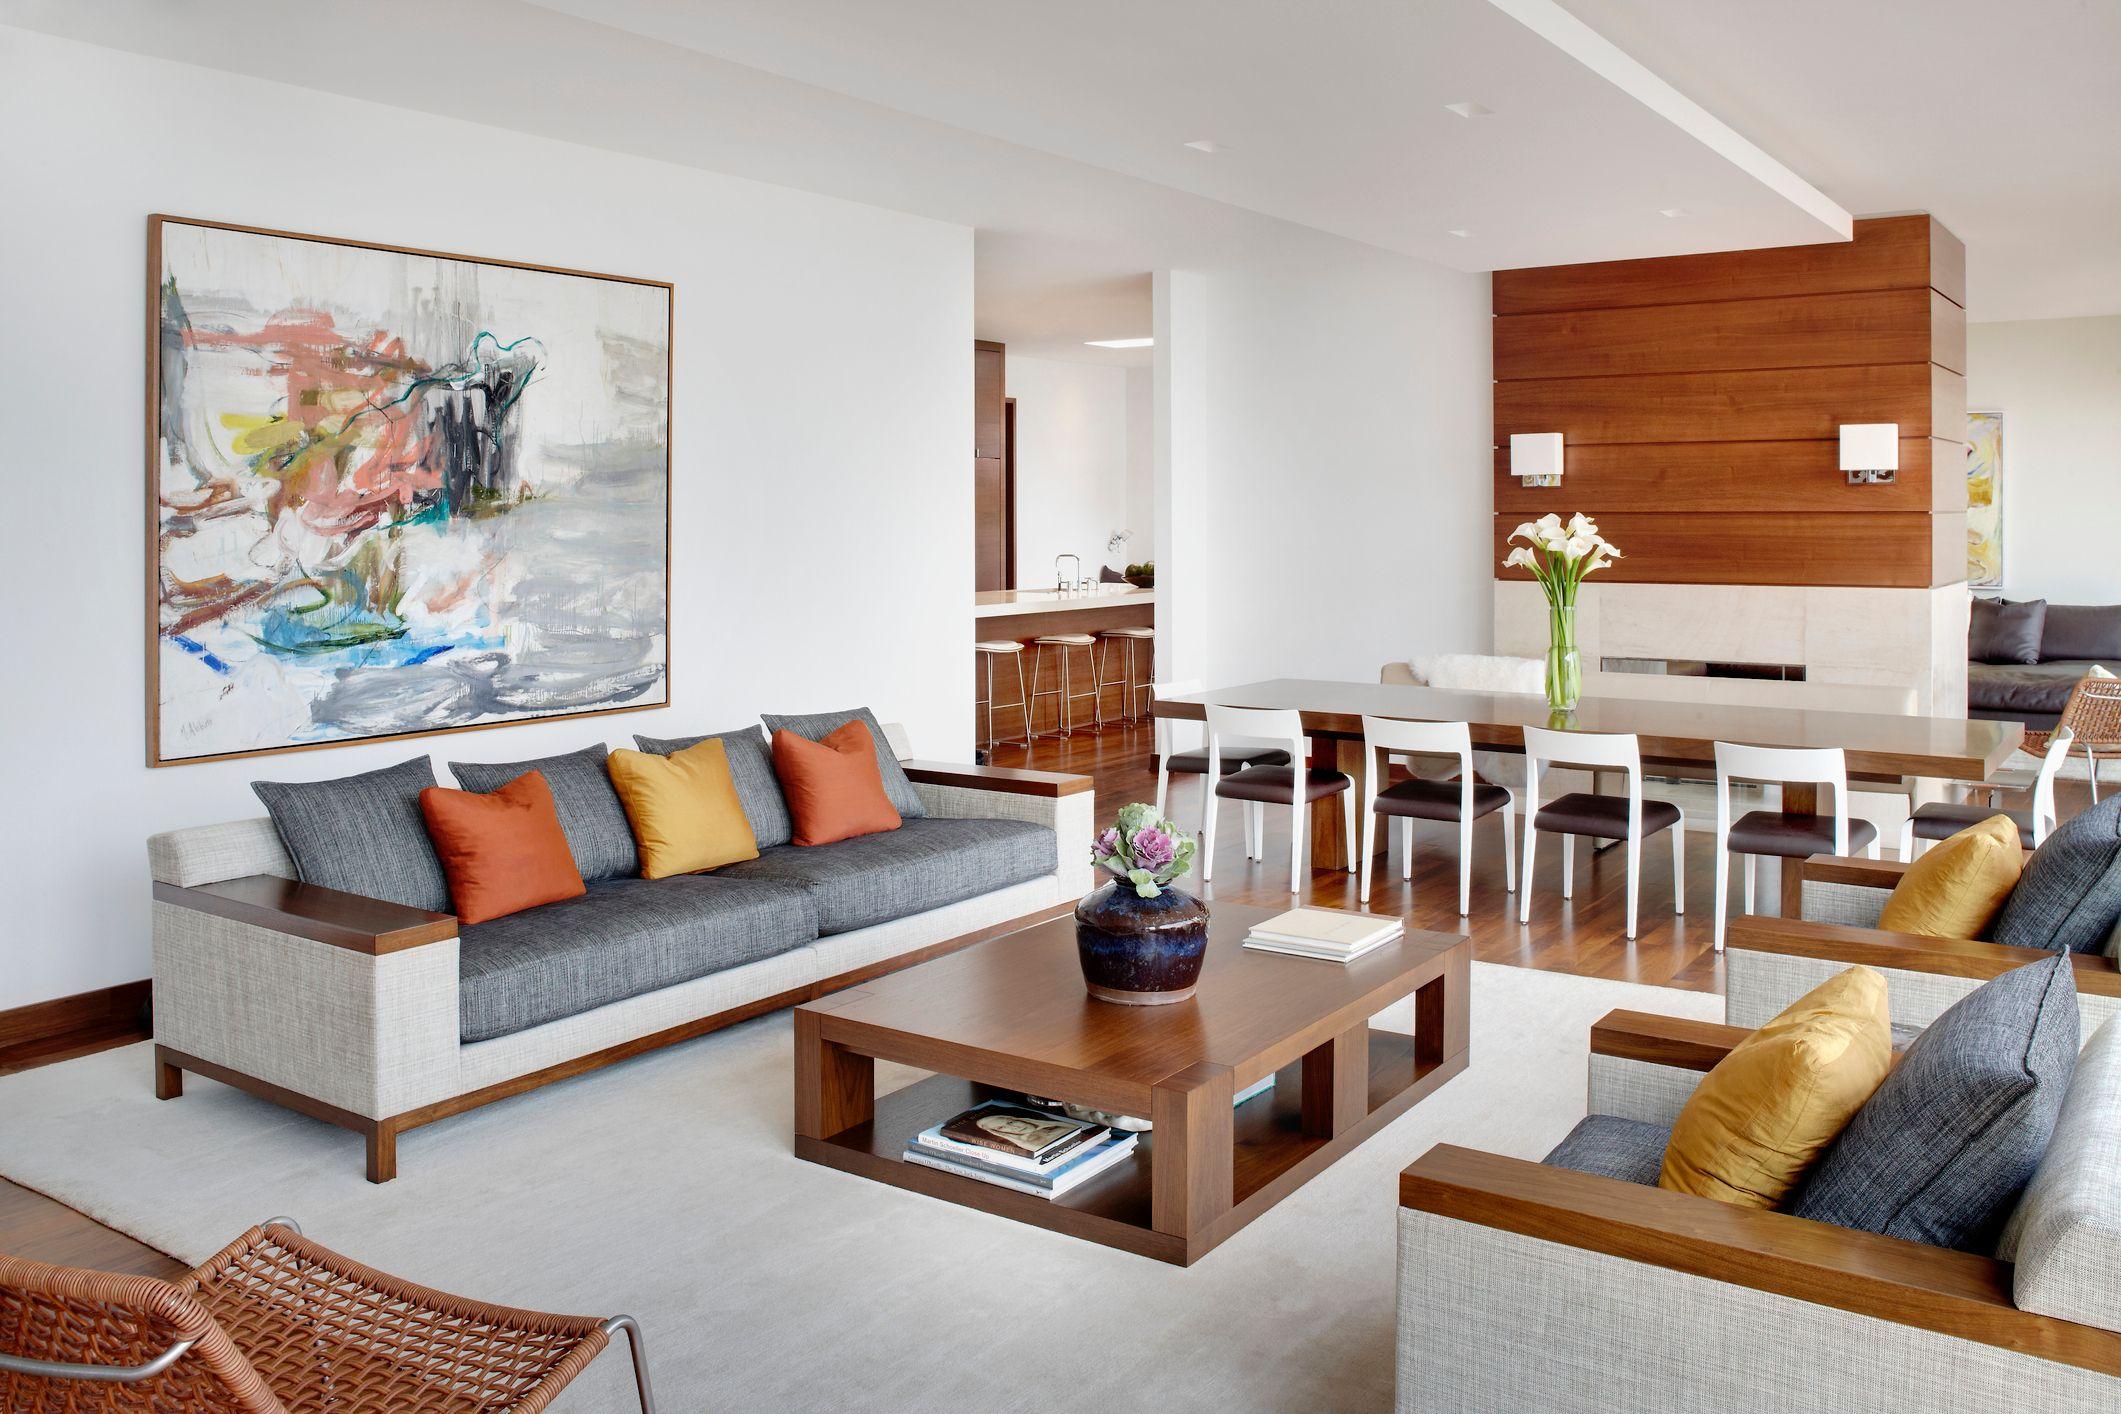 Diy Easily Interior Design Your Own Home Mymove Interior Decorating Living Room Interior Design Home Interior Design